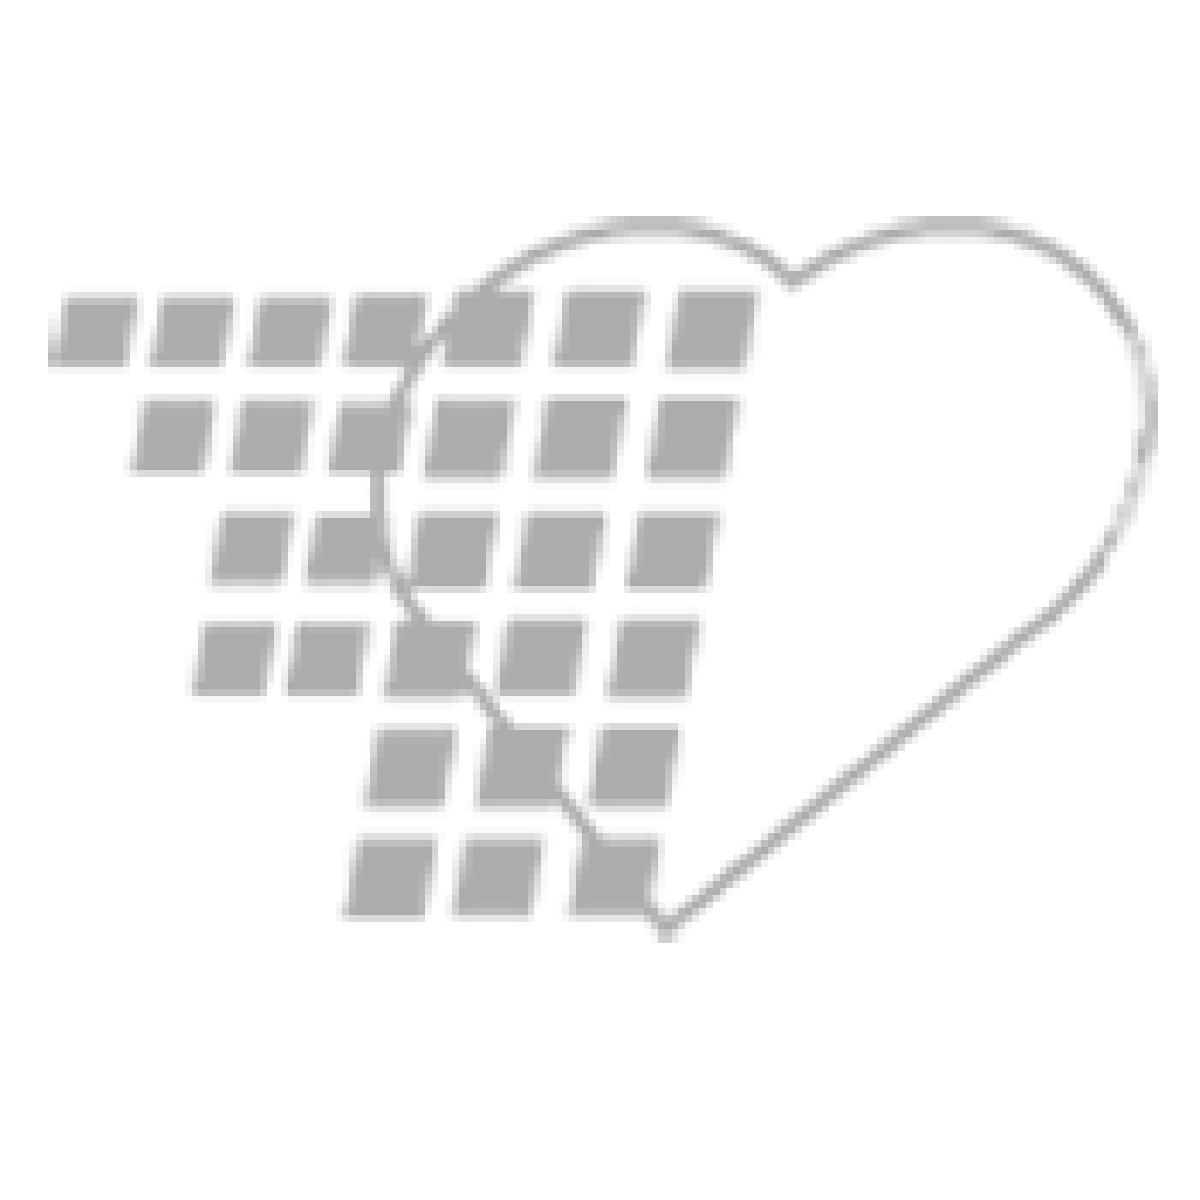 02-92-1108 - Skyndex®Skinfold Caliper Durnin/Slaughter-Lohman - 14 x 5 x 10 Inch